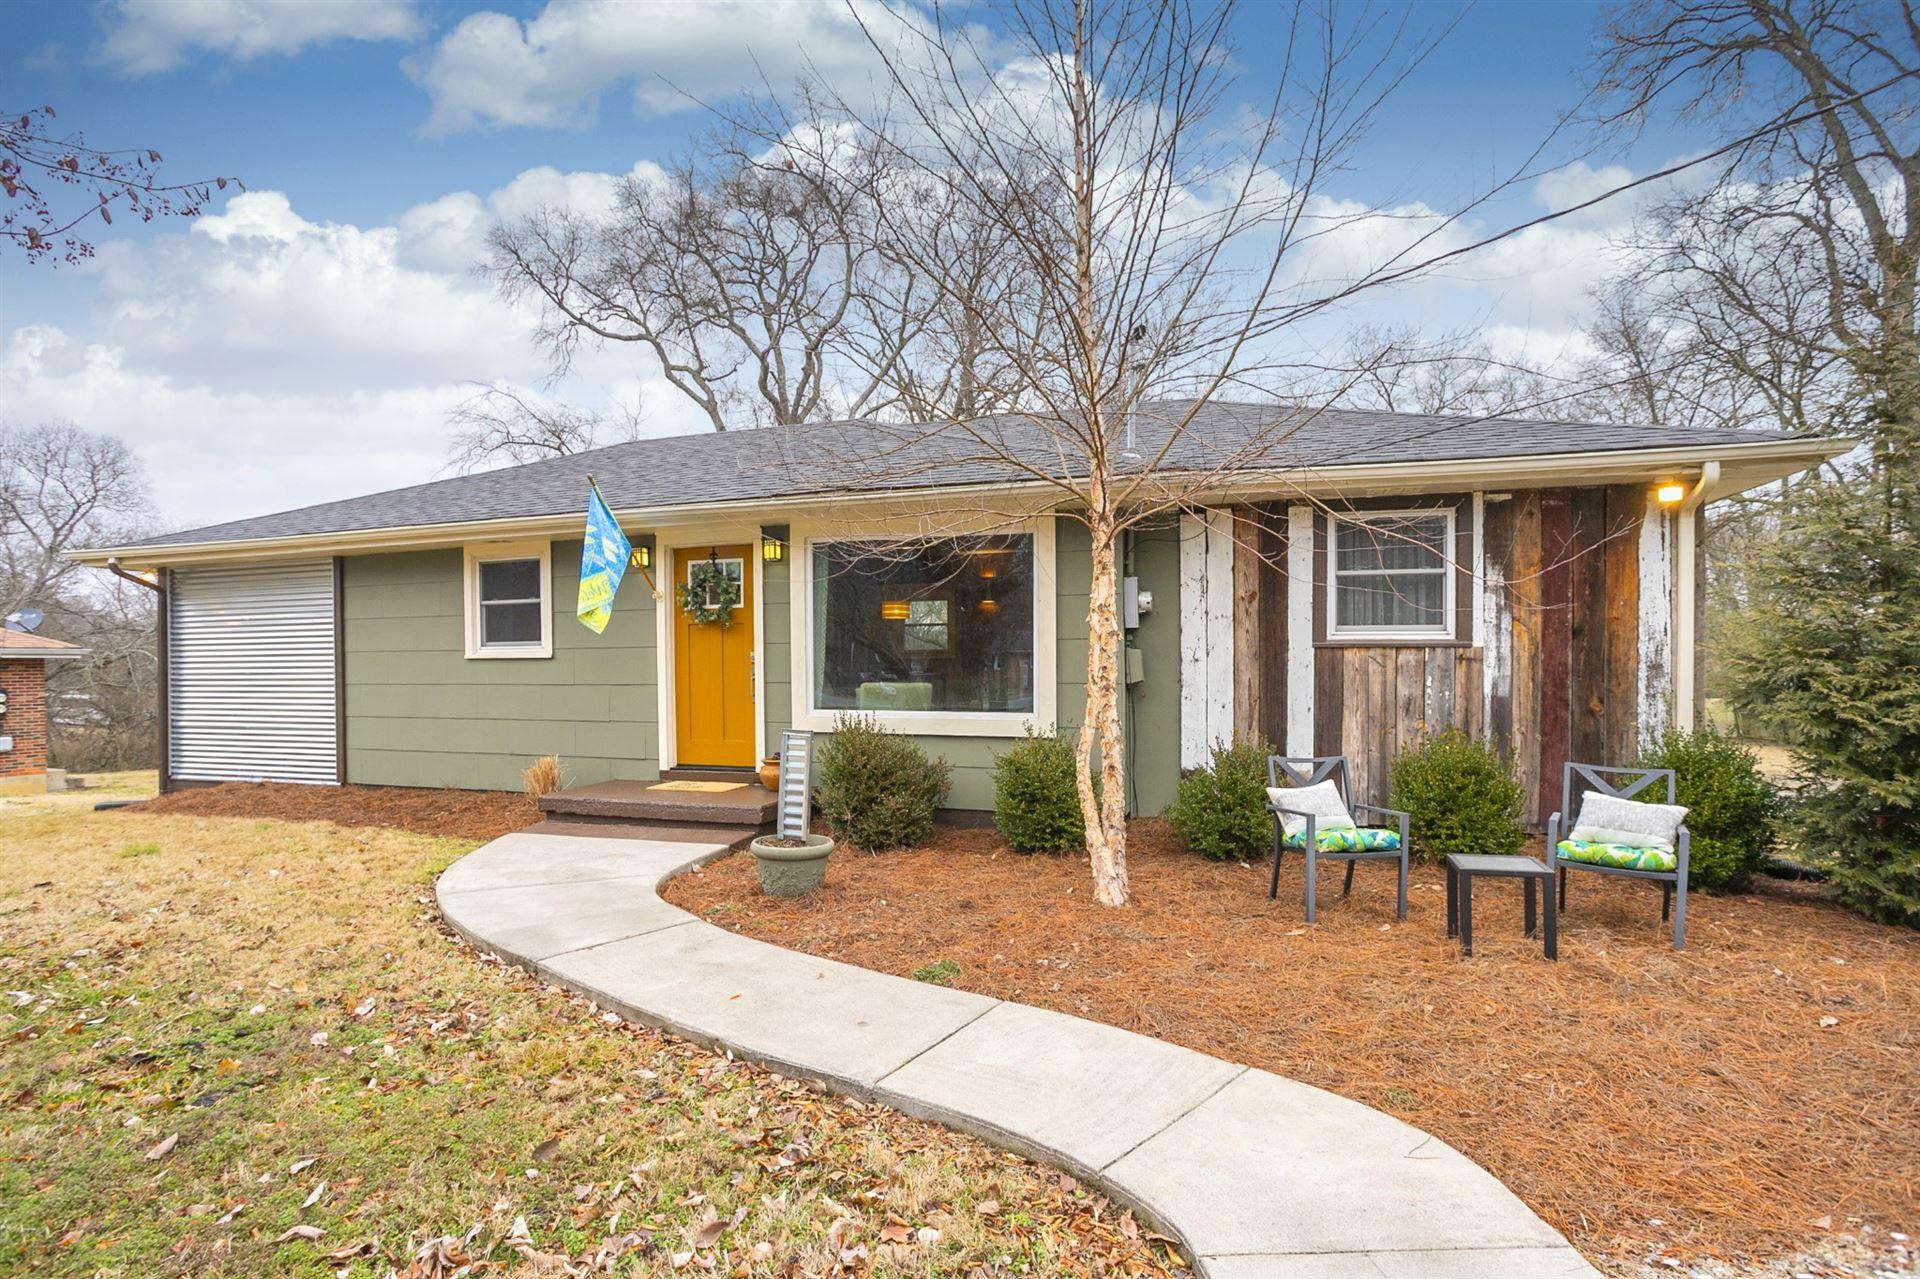 850 Wren Rd, Goodlettsville, TN 37072 - MLS#: 2230057